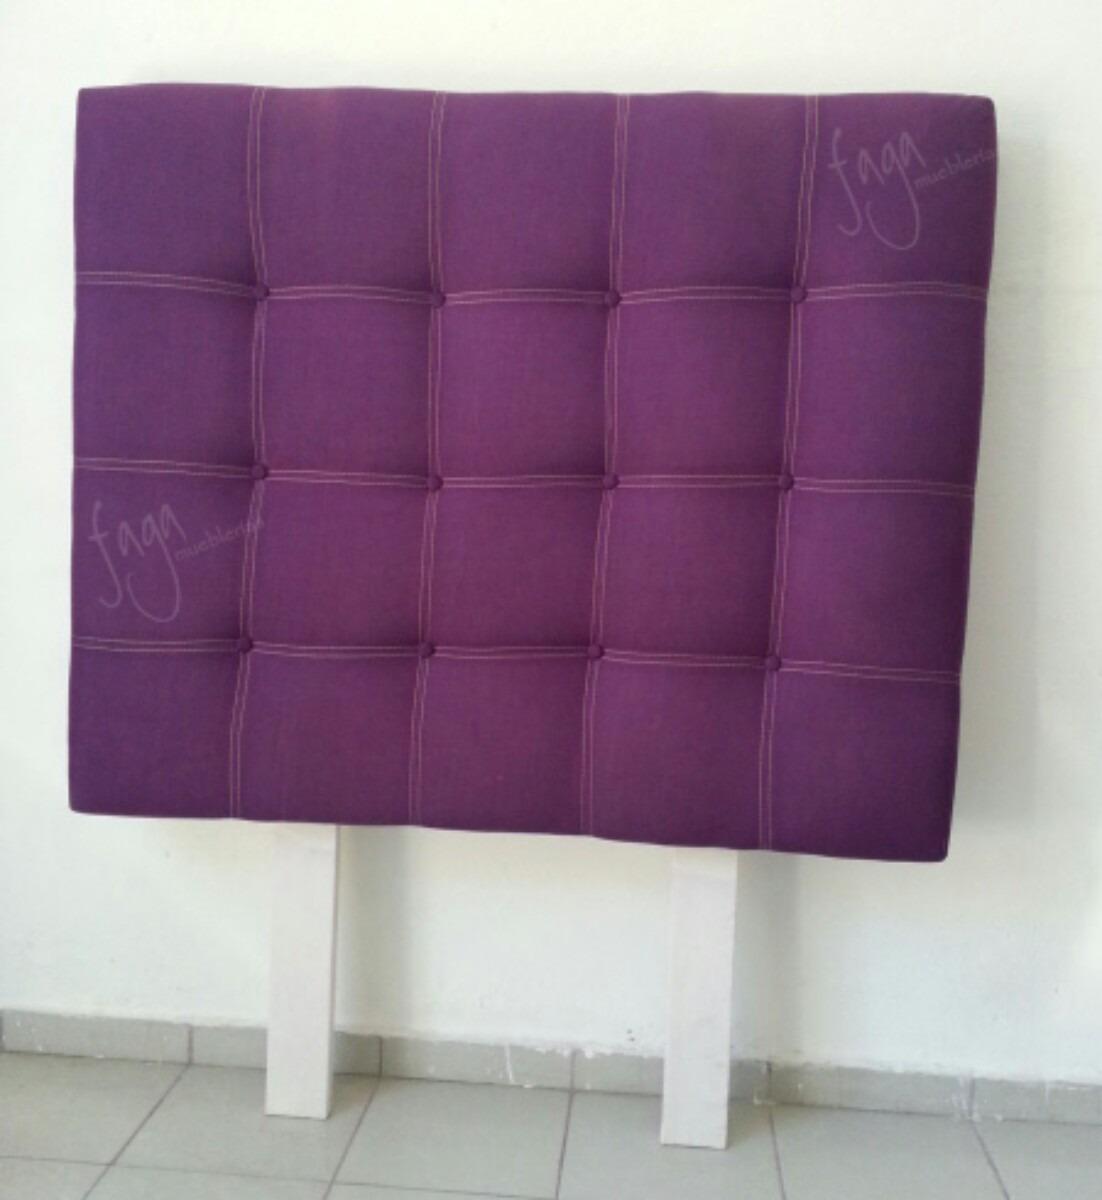 cabecera roja tapizada para cama queen size o matrimonial